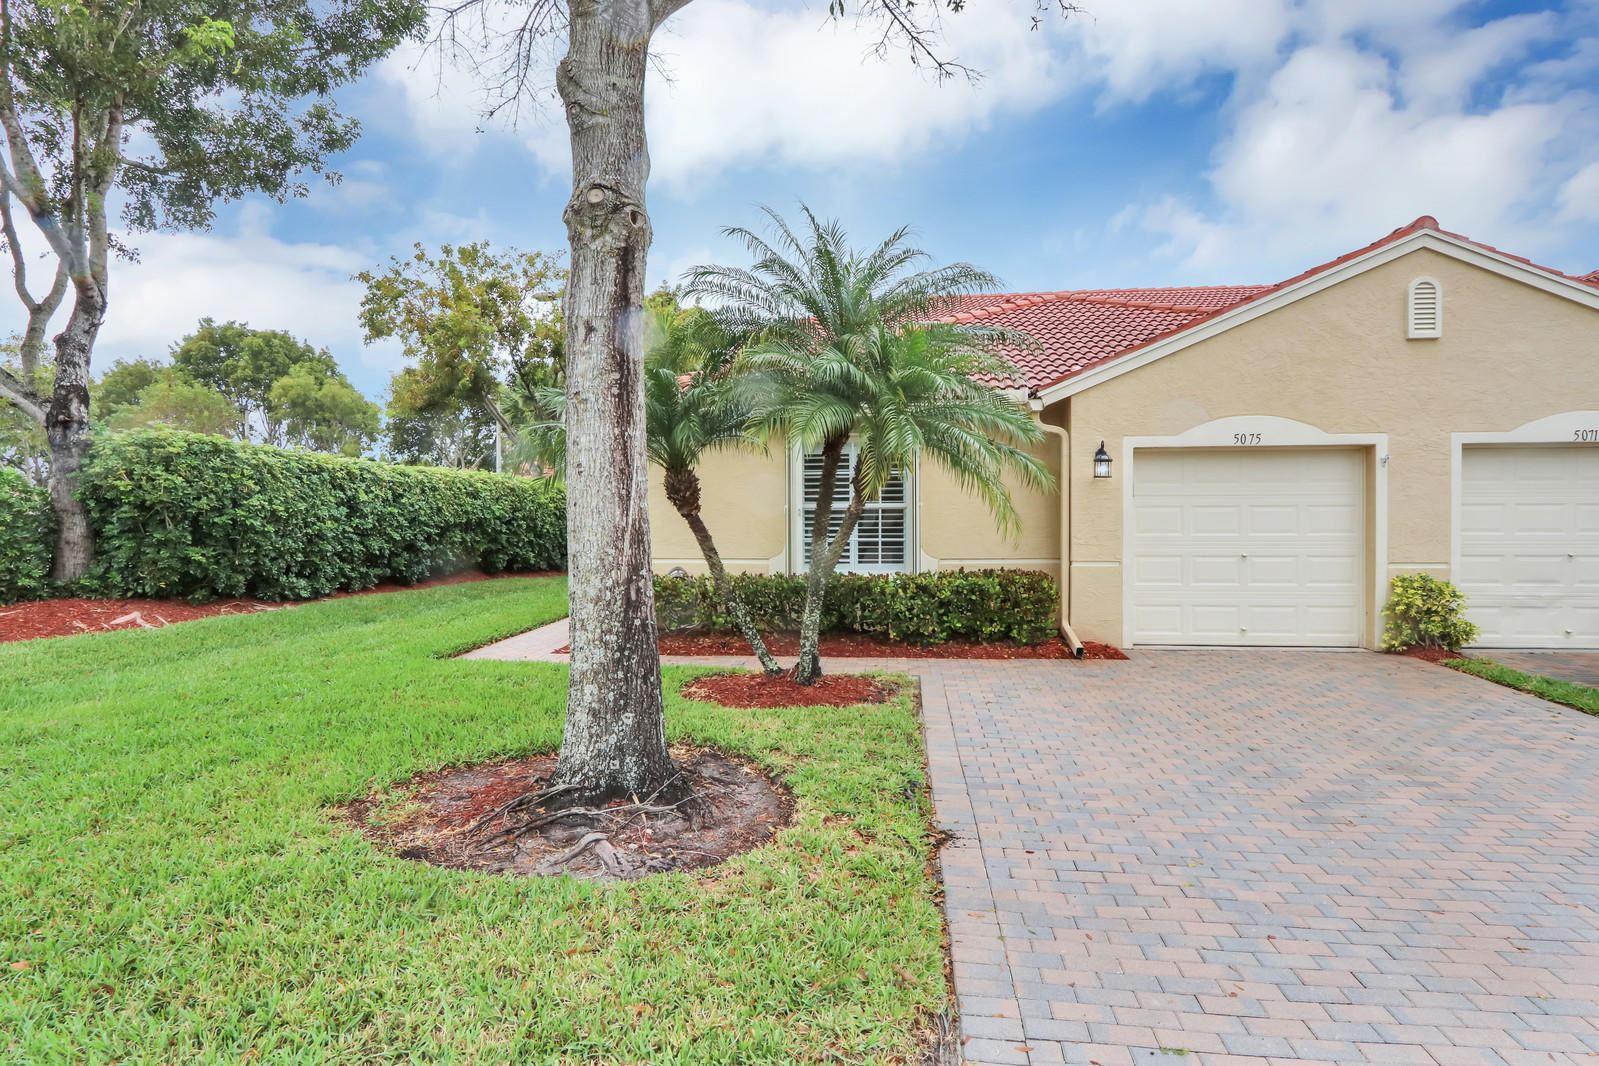 5075 Palazzo Place, Boynton Beach, FL 33437 - #: RX-10603913